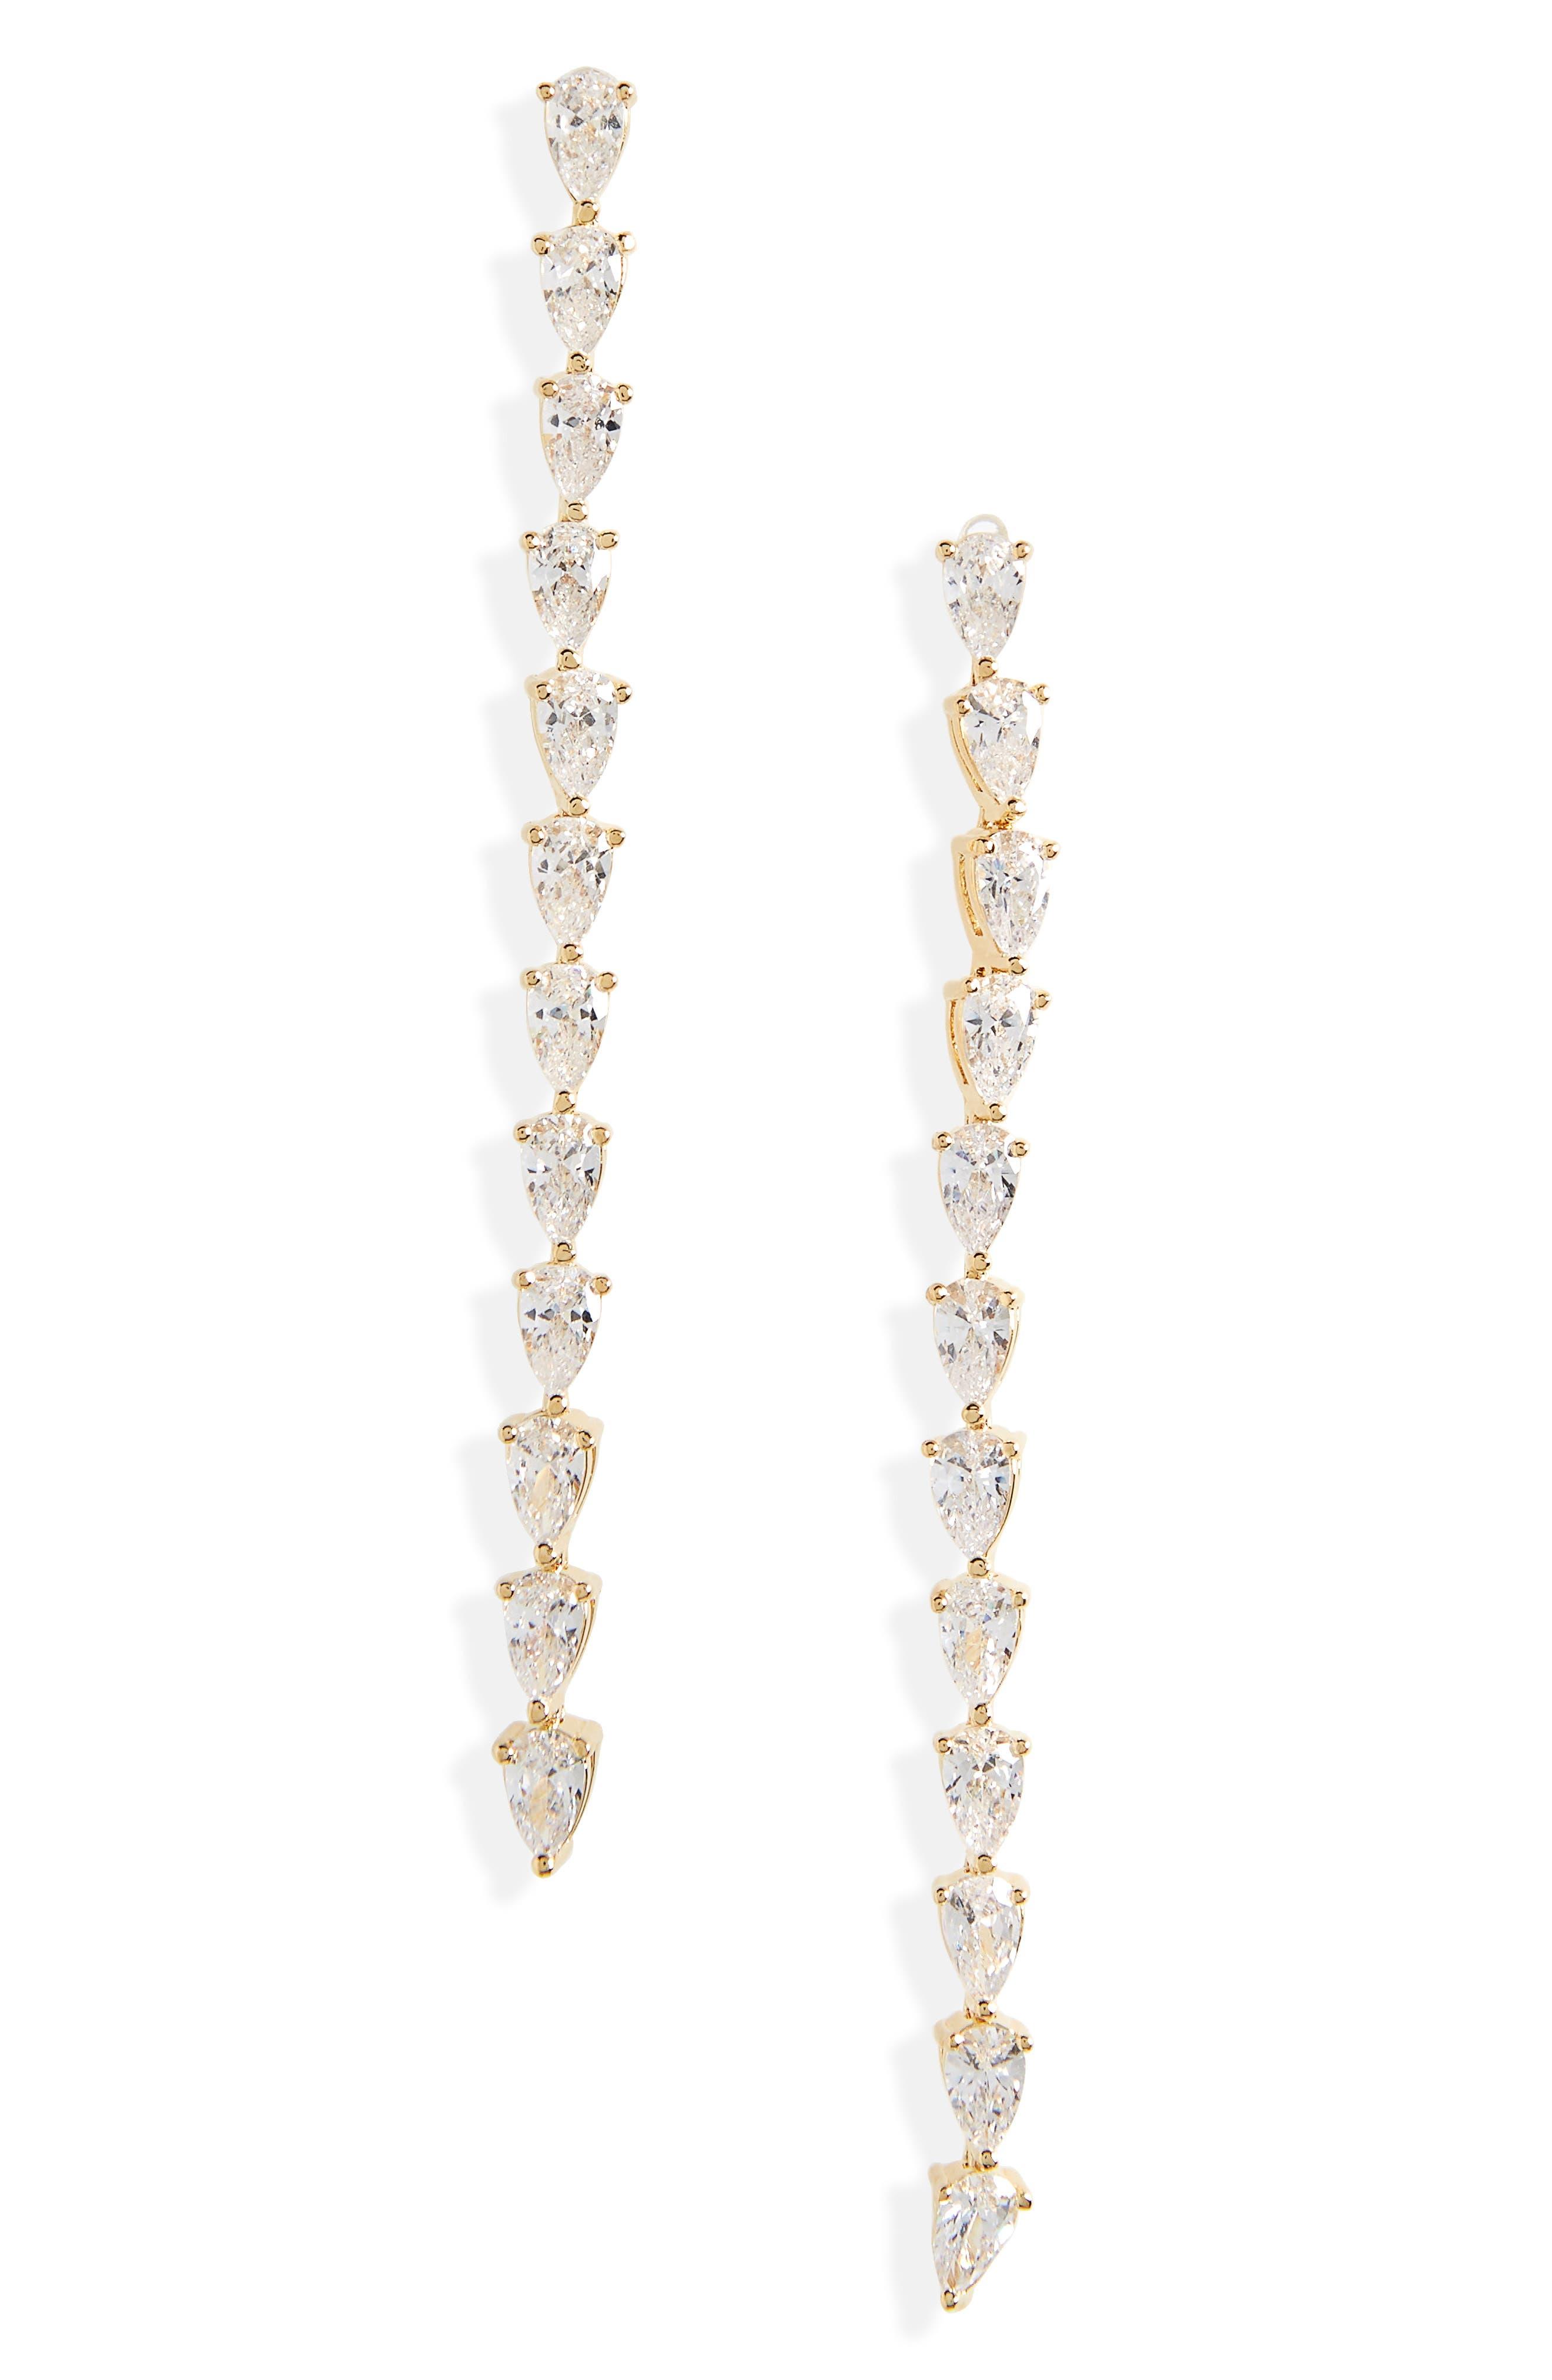 Image of Nordstrom Pear Cubic Zirconia Linear Earrings